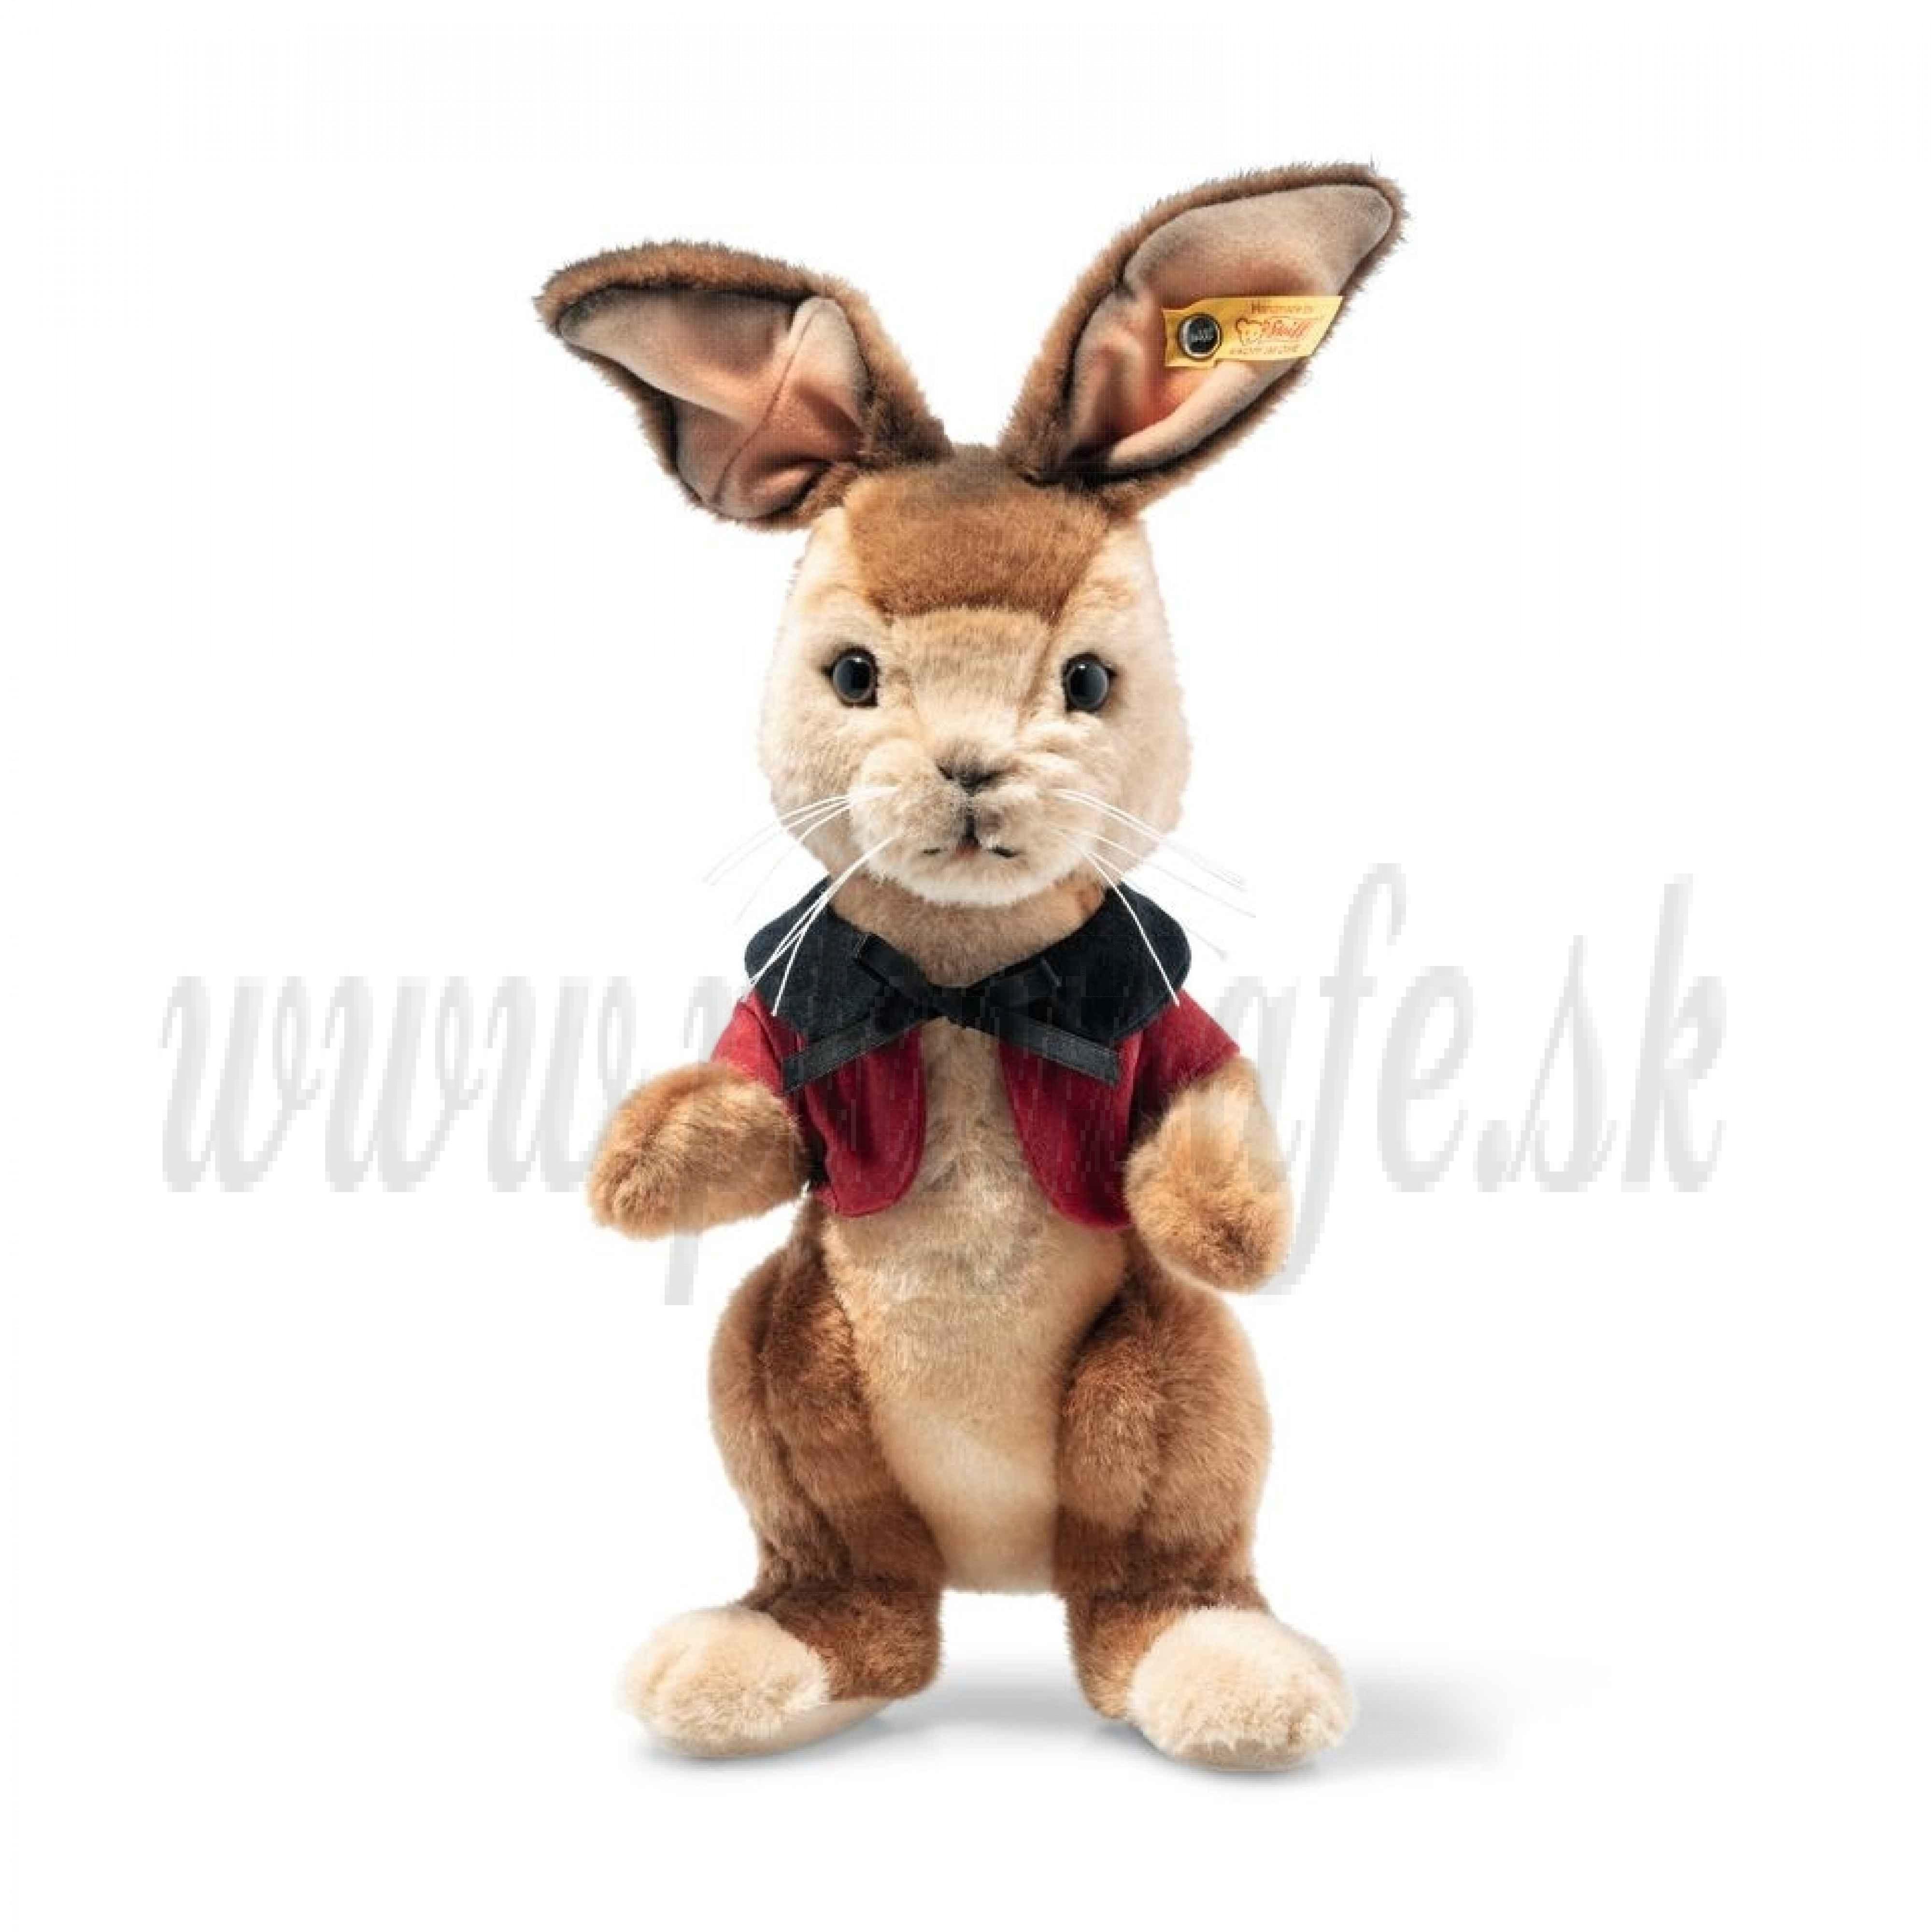 Steiff Peter Rabbit Plyšový zajac Flopsy Bunny, 25cm